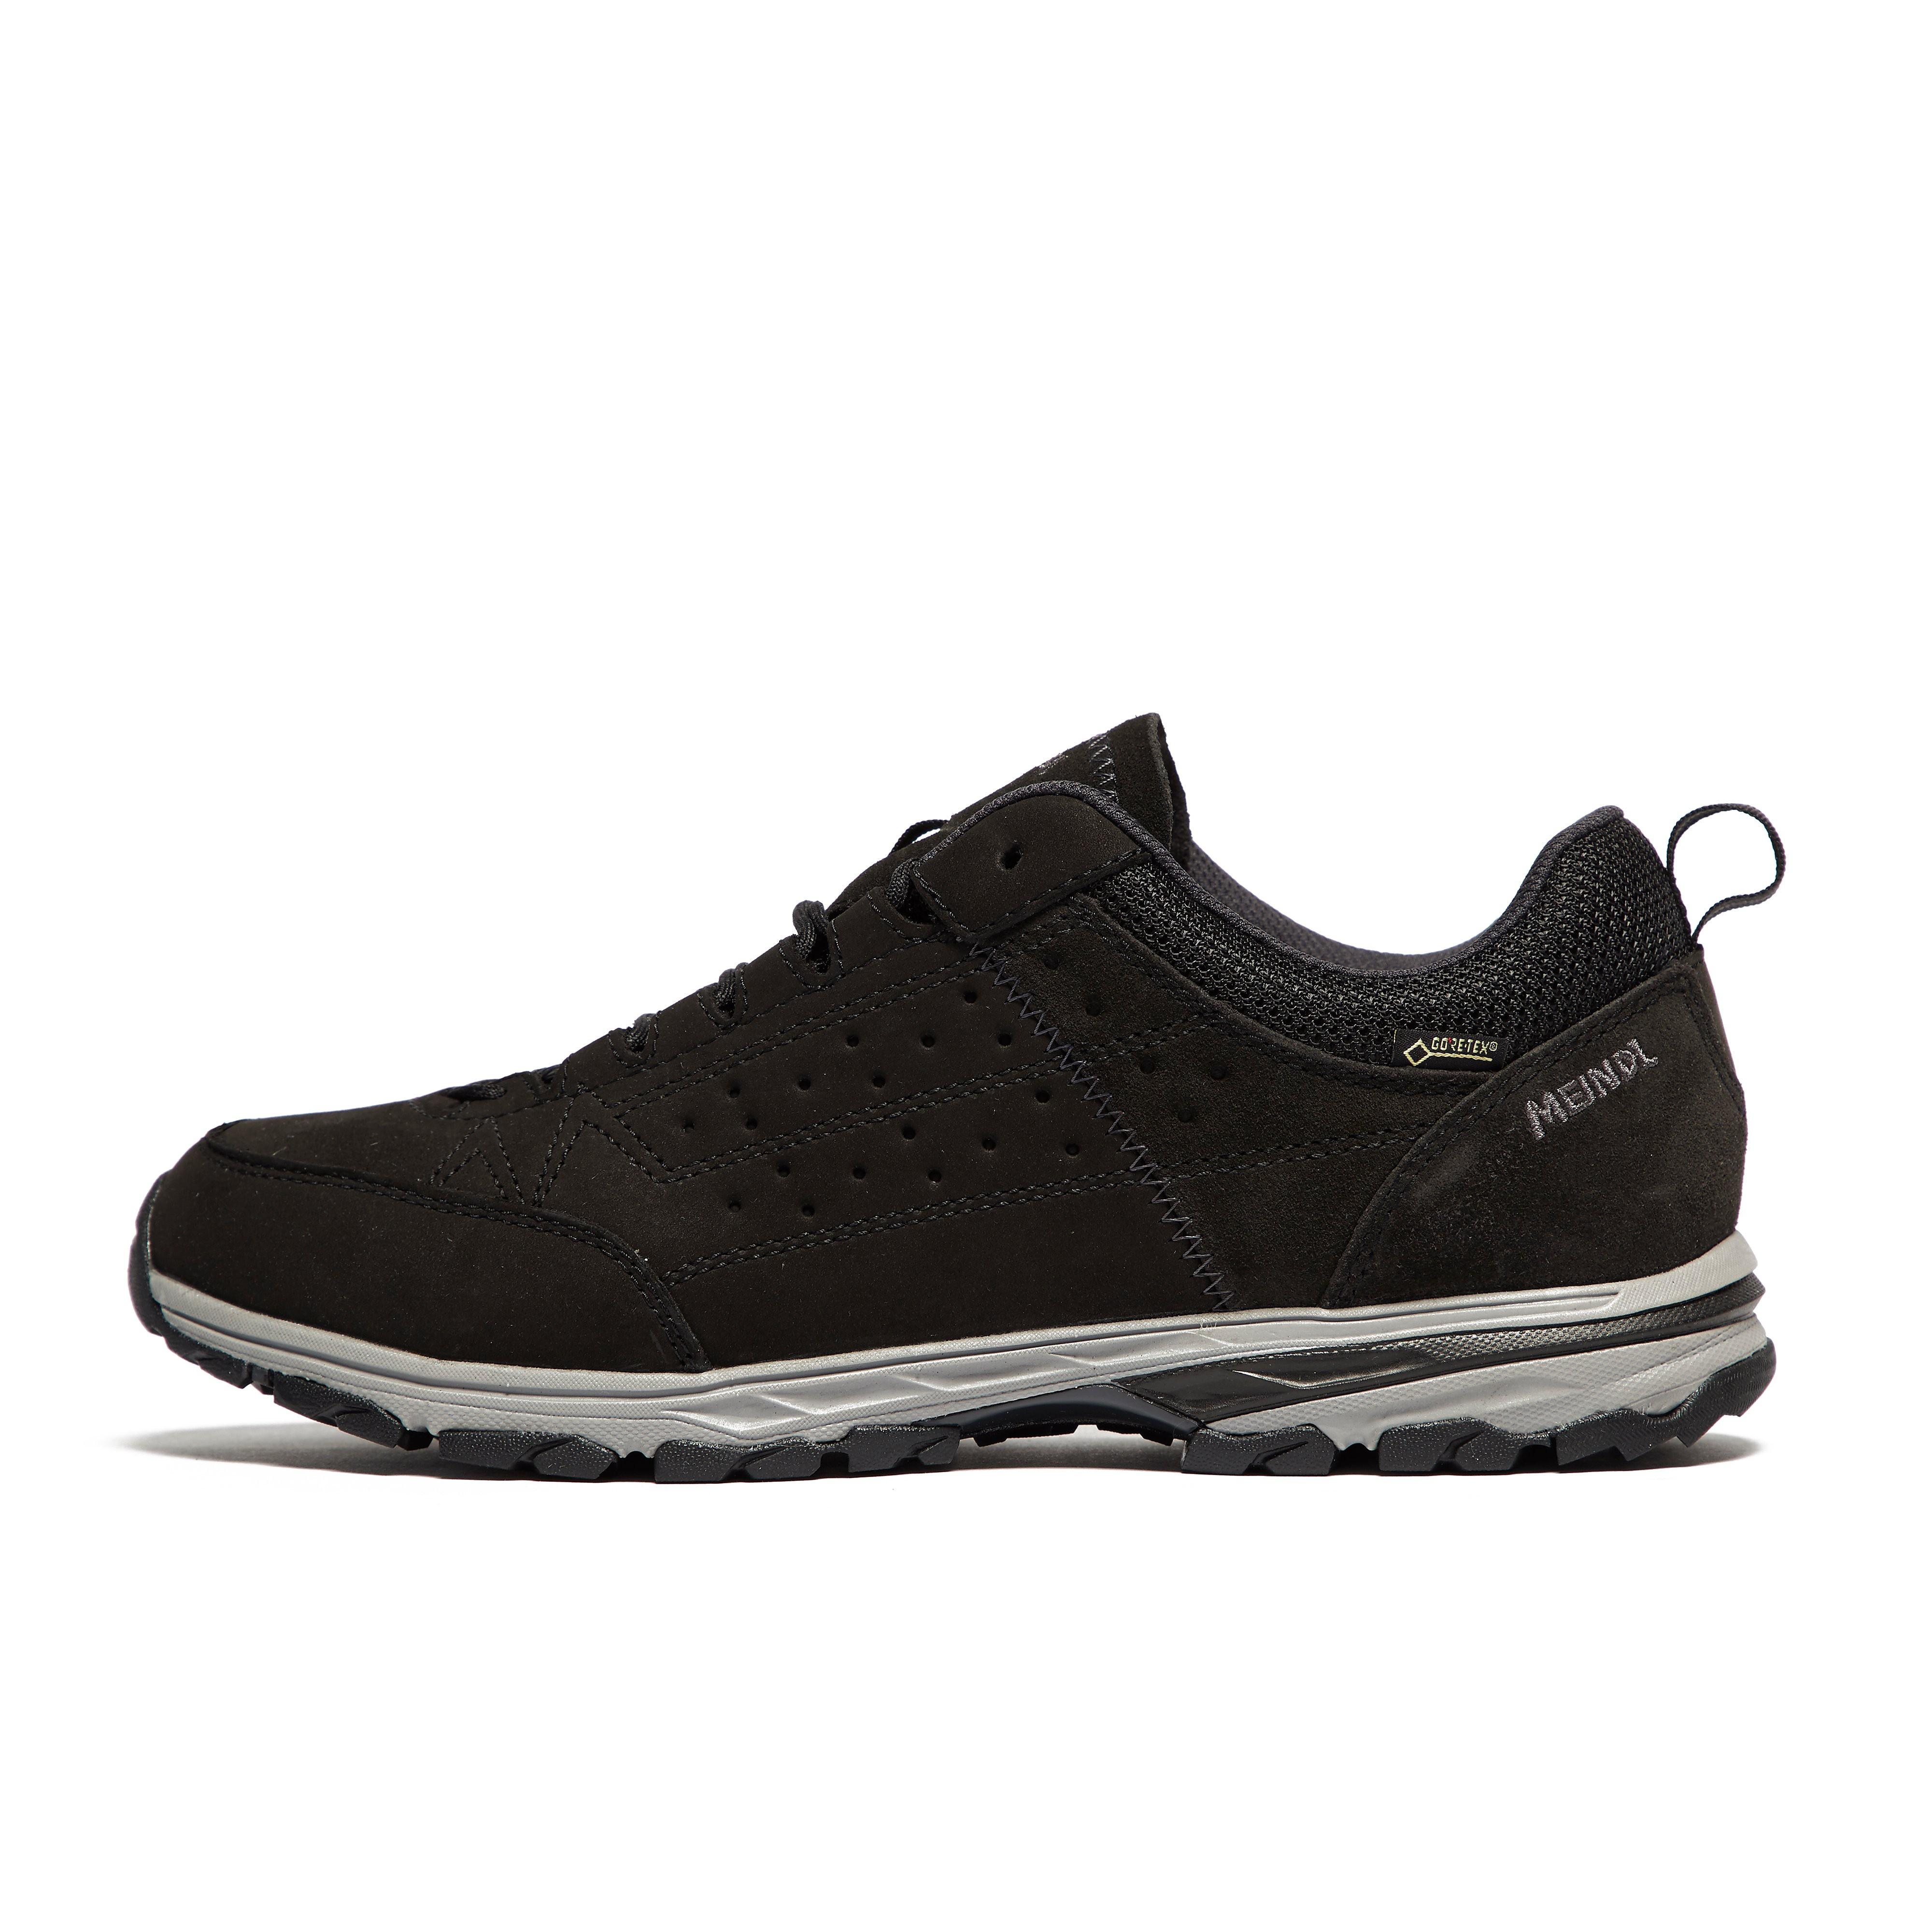 Meindl Durban GTX Men's Walking Shoes